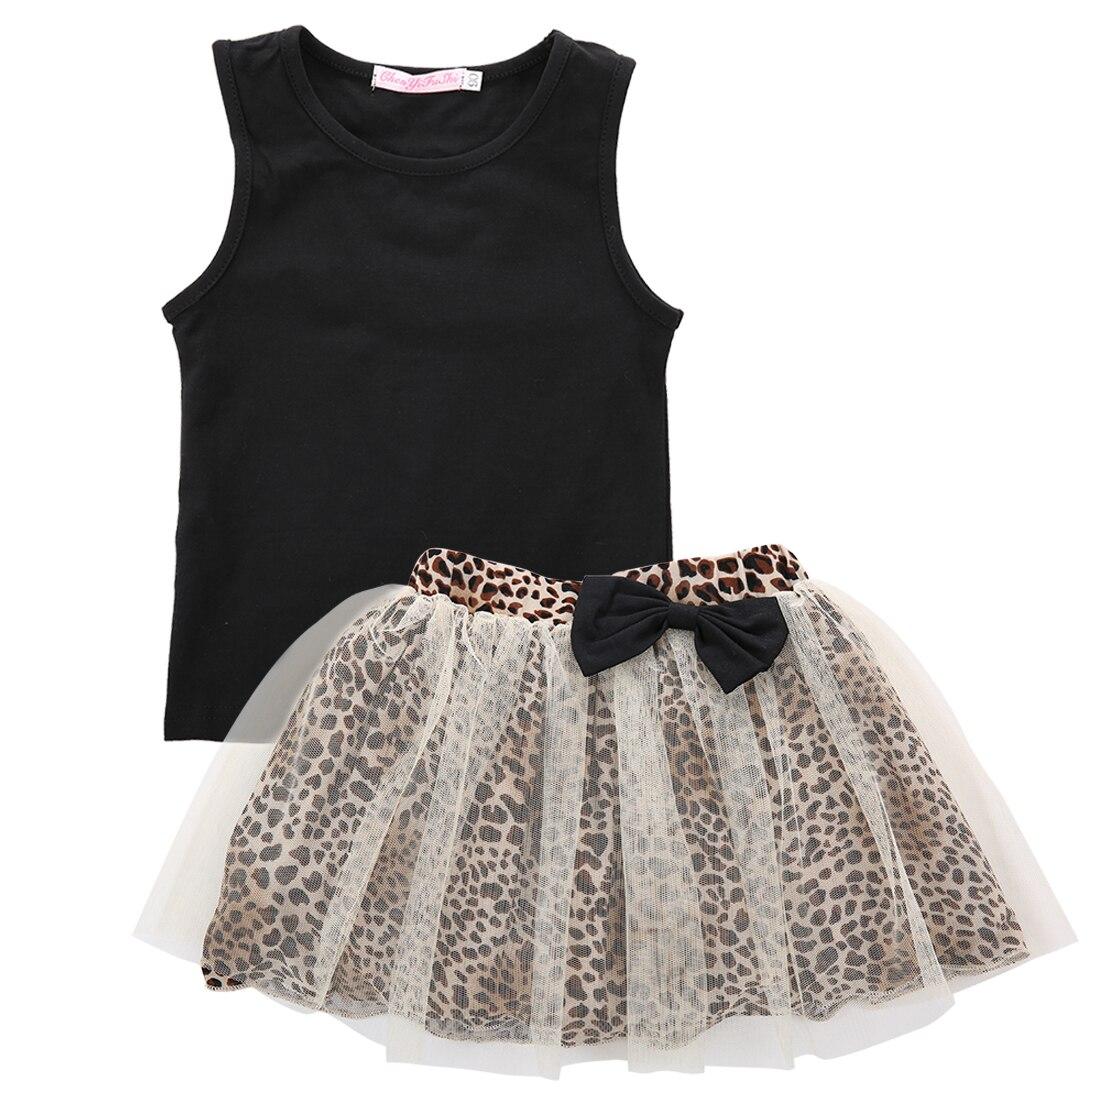 Cotton//Lycra® Baby Girls Frock Dress Top Size 0000 ~ 8 VERY Cute OWL Print